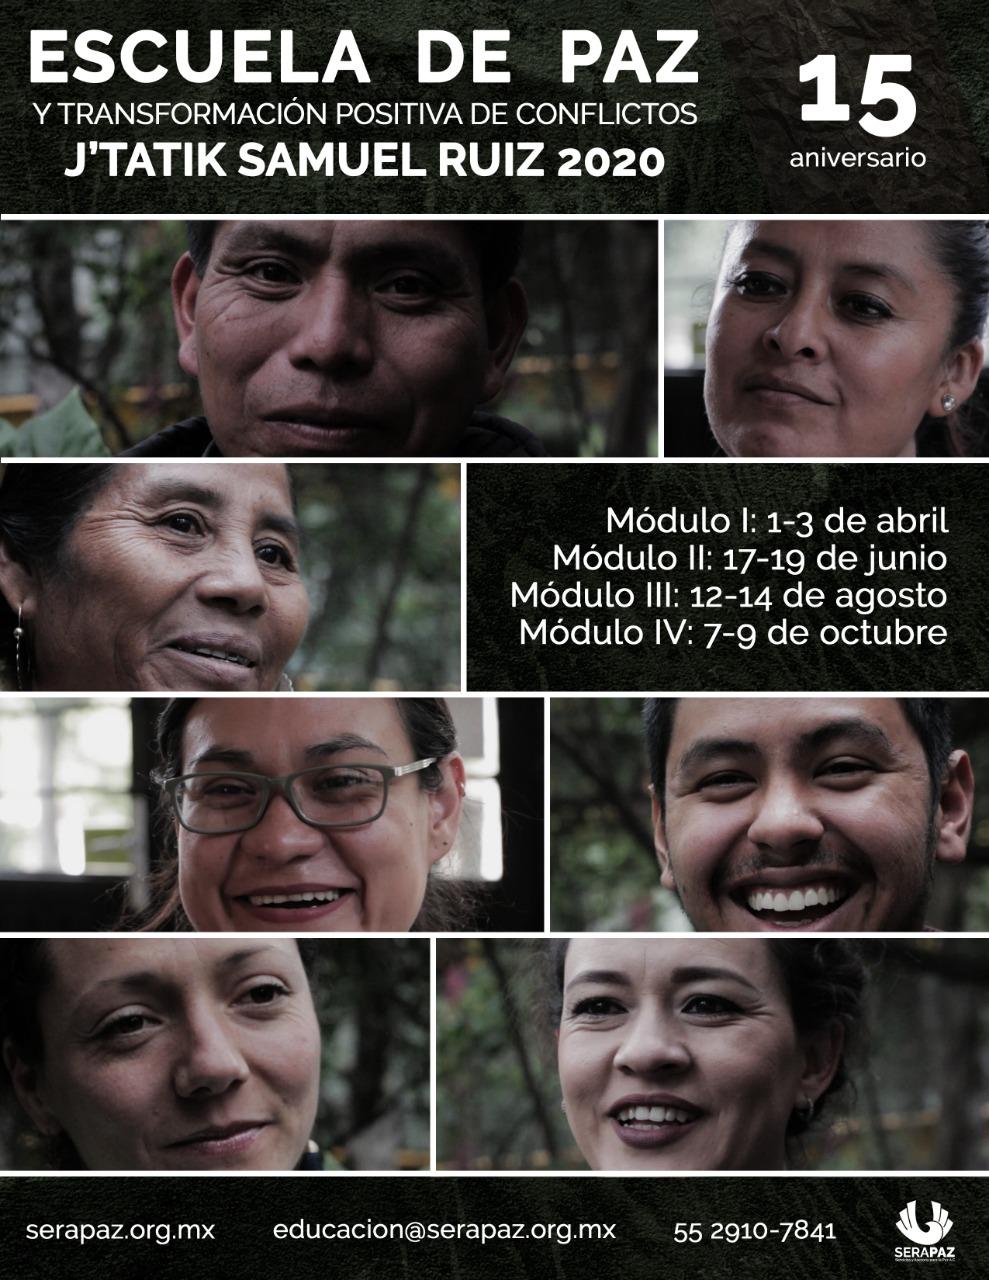 Escuela de Paz Nacional J'Tatik Samuel Ruiz, 2020